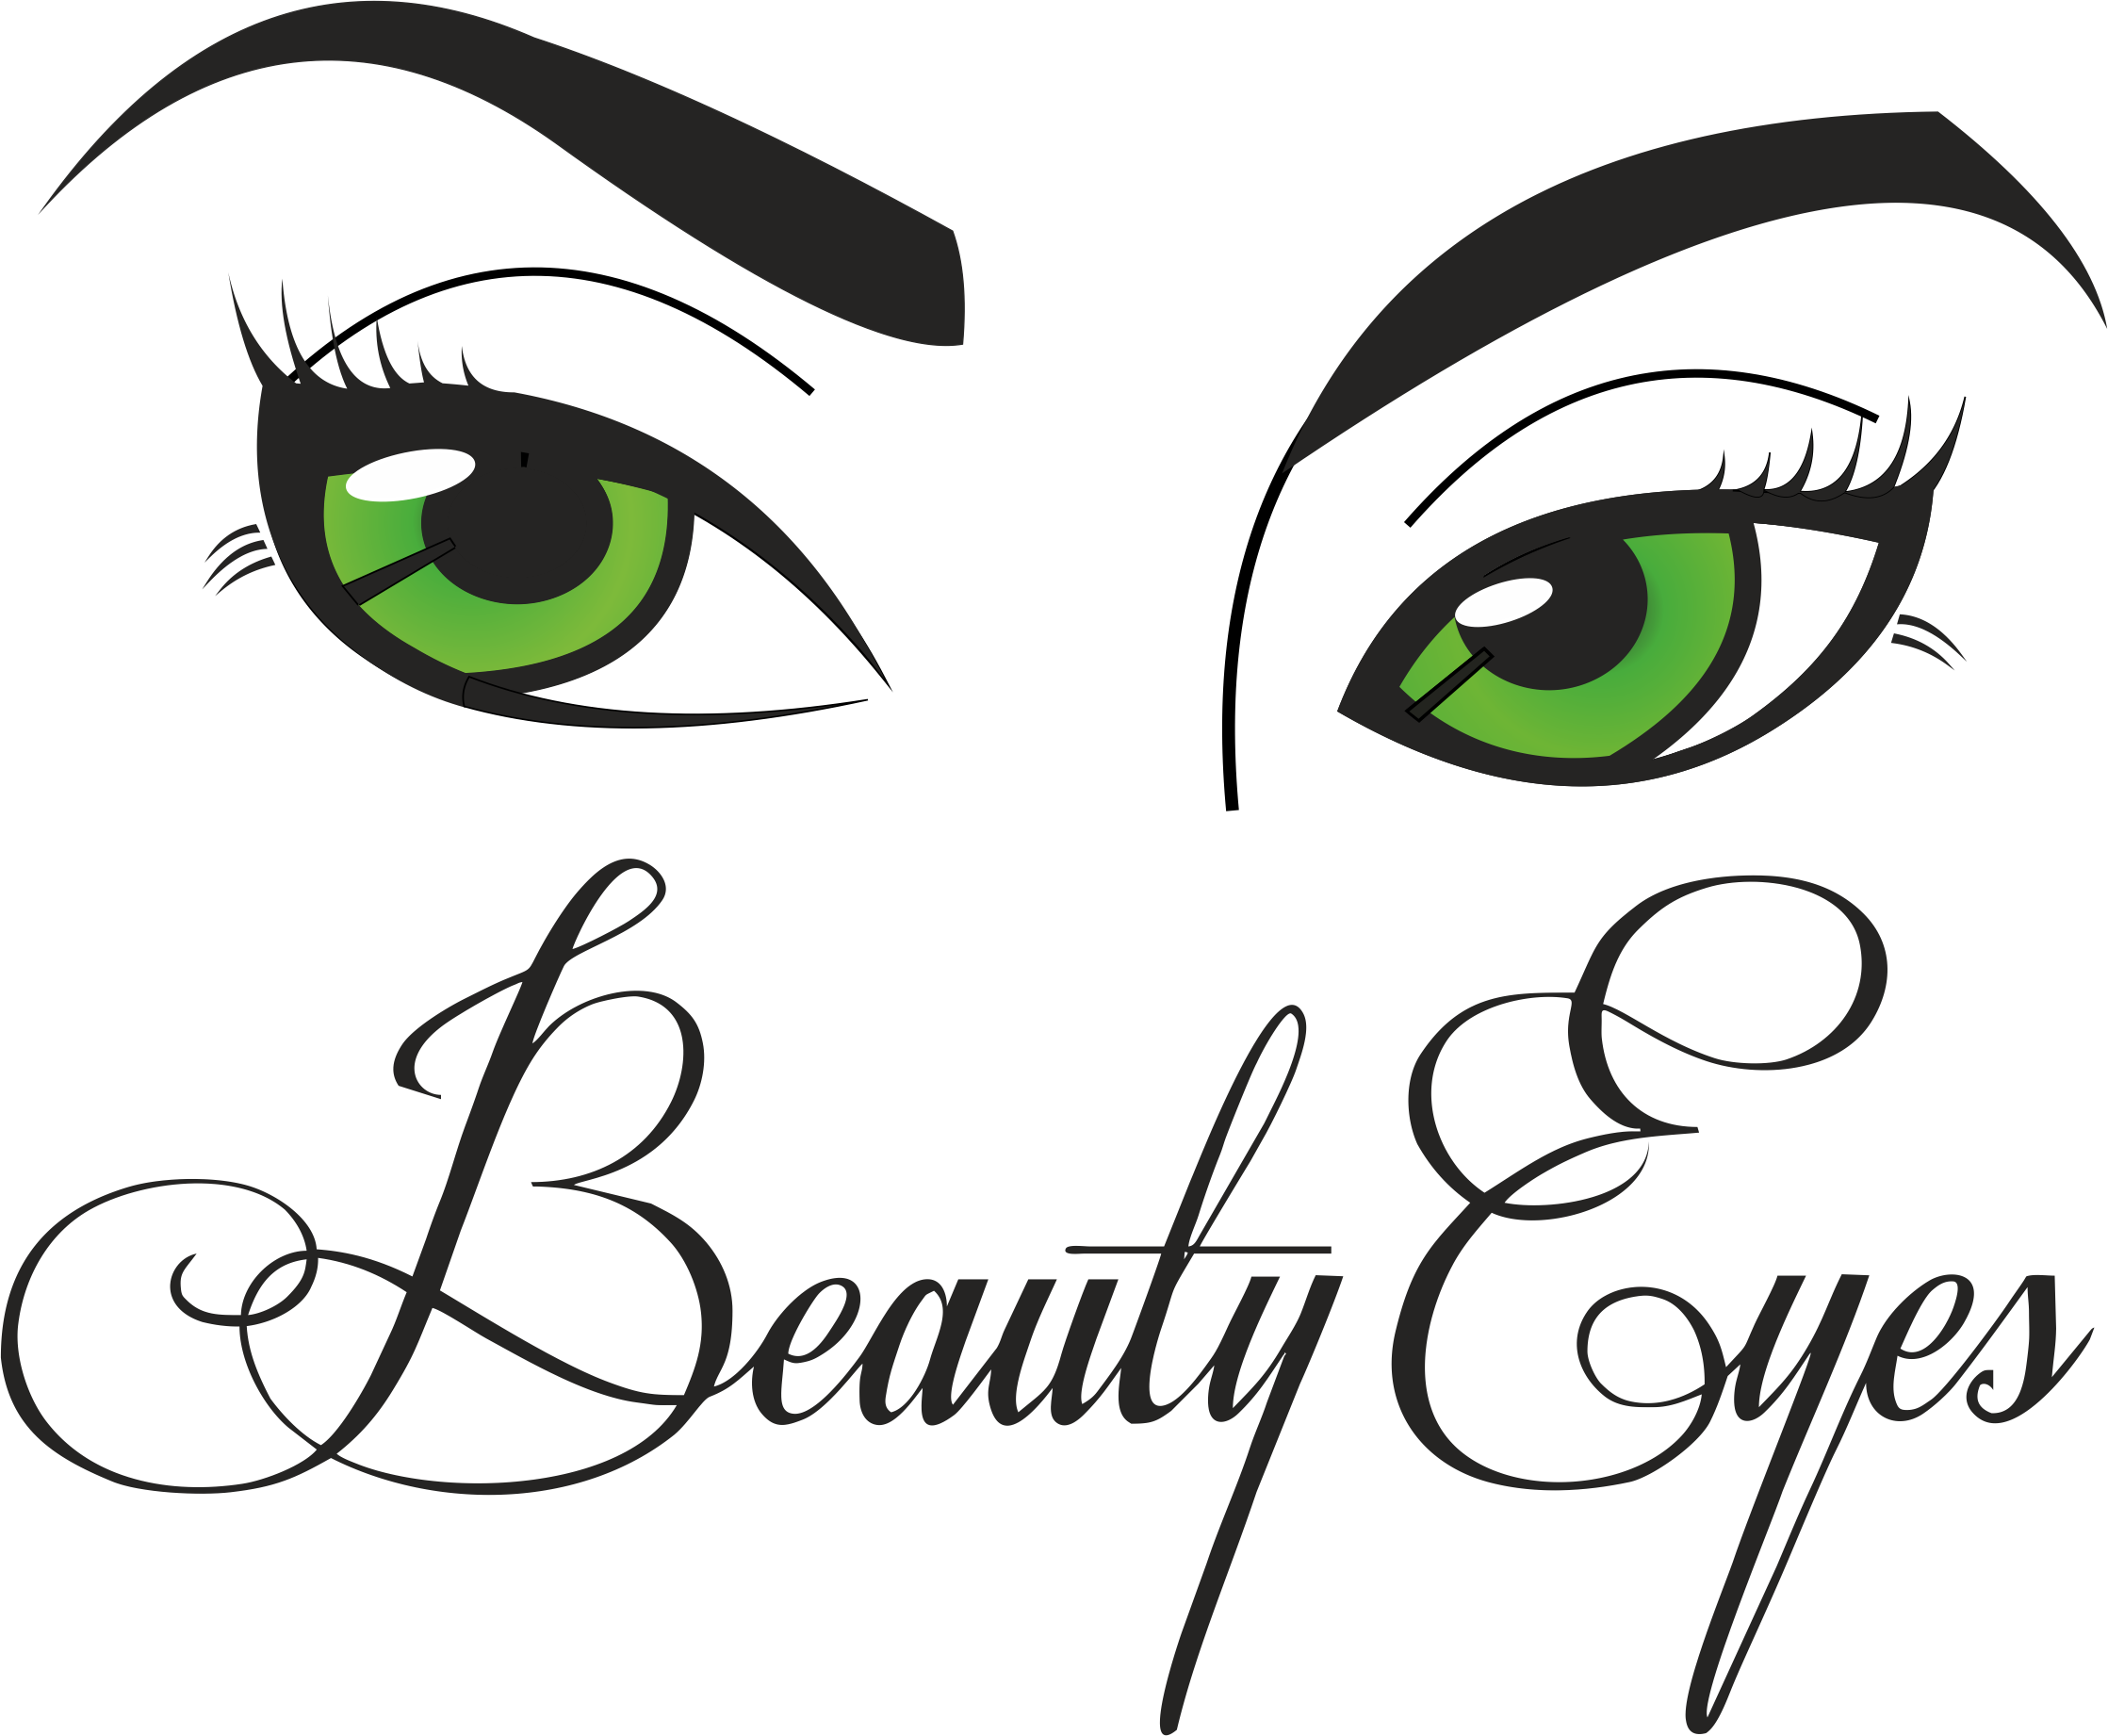 Наращивание ресниц и моделирование бровей в Минске | Beauty Eyes